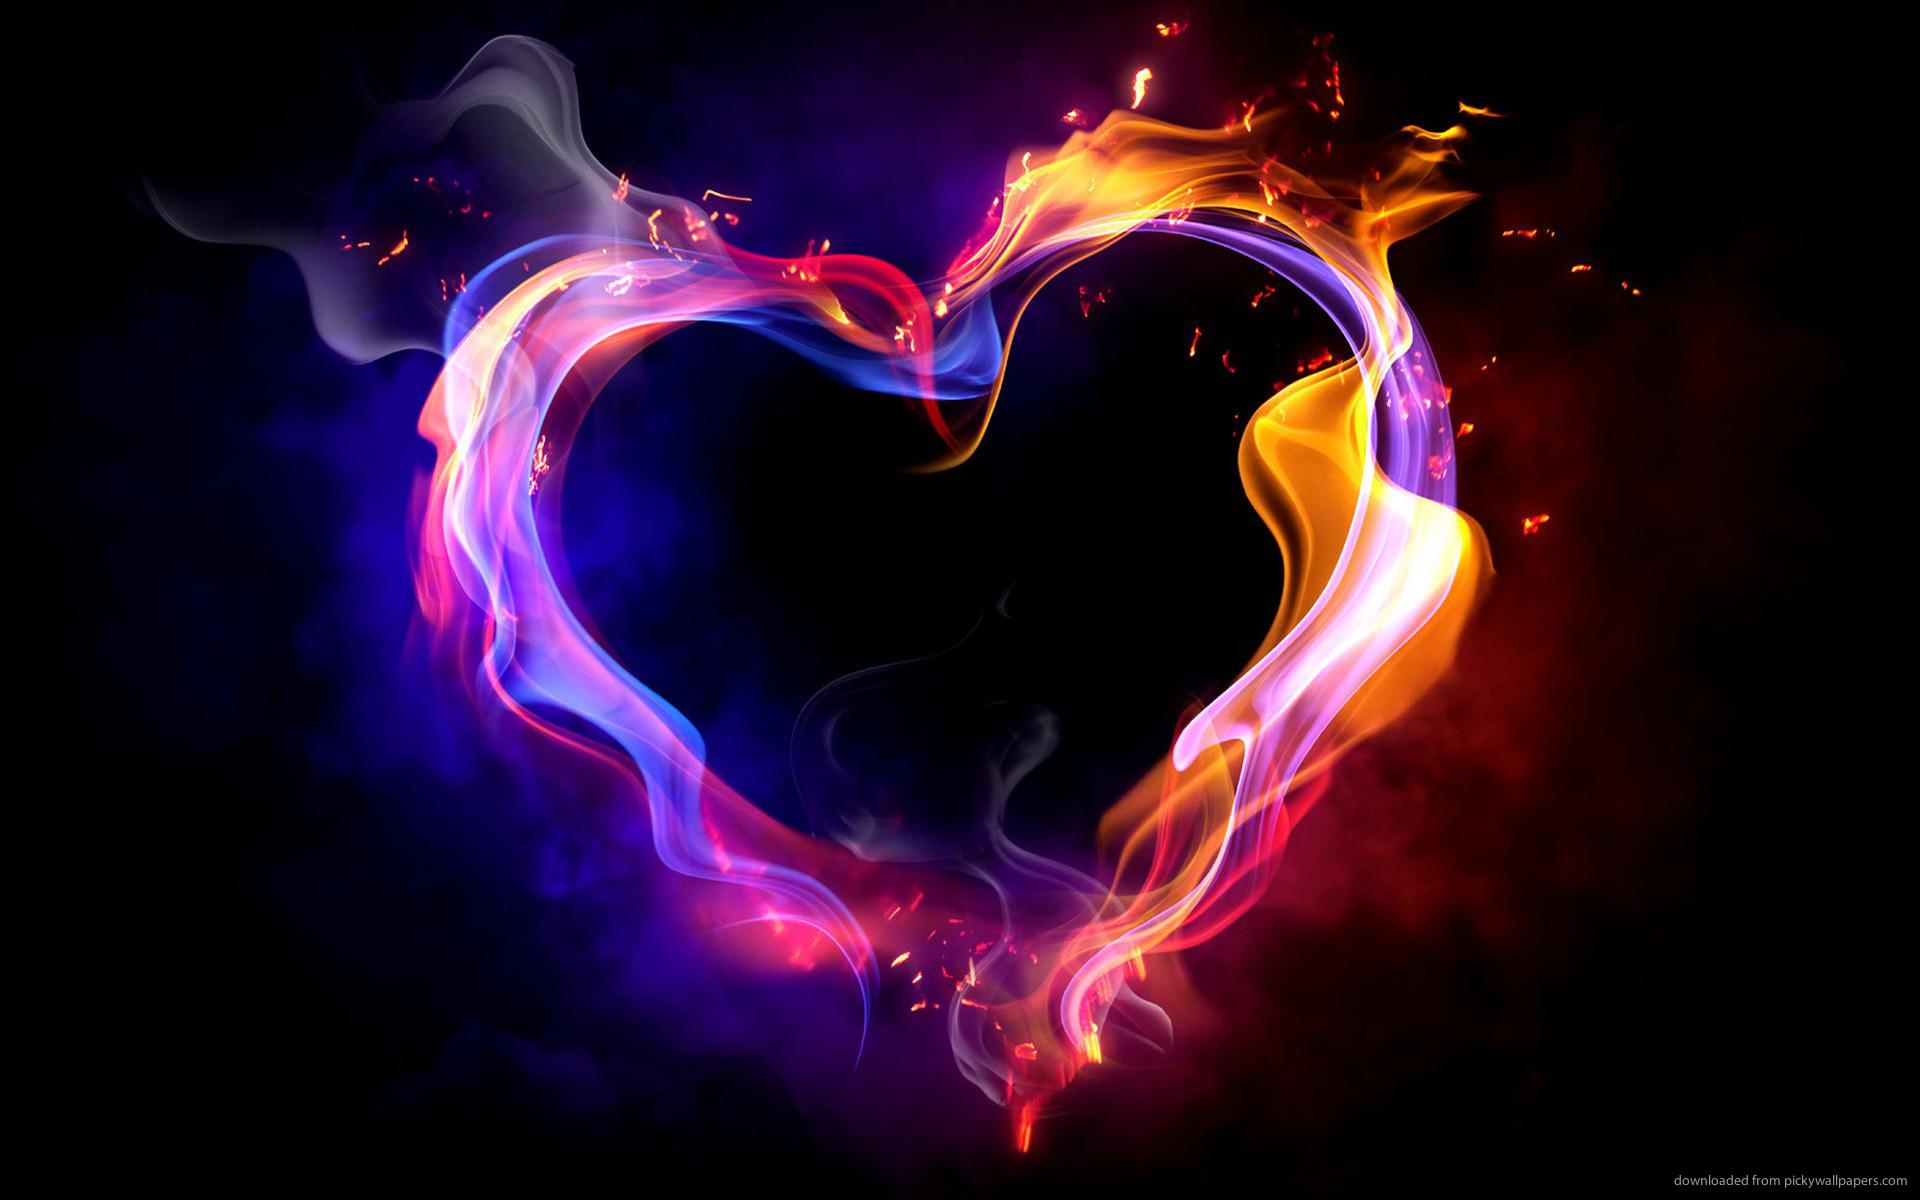 Releasing Heart Wall Higher Density Blog   Clip Art Library 1920x1200